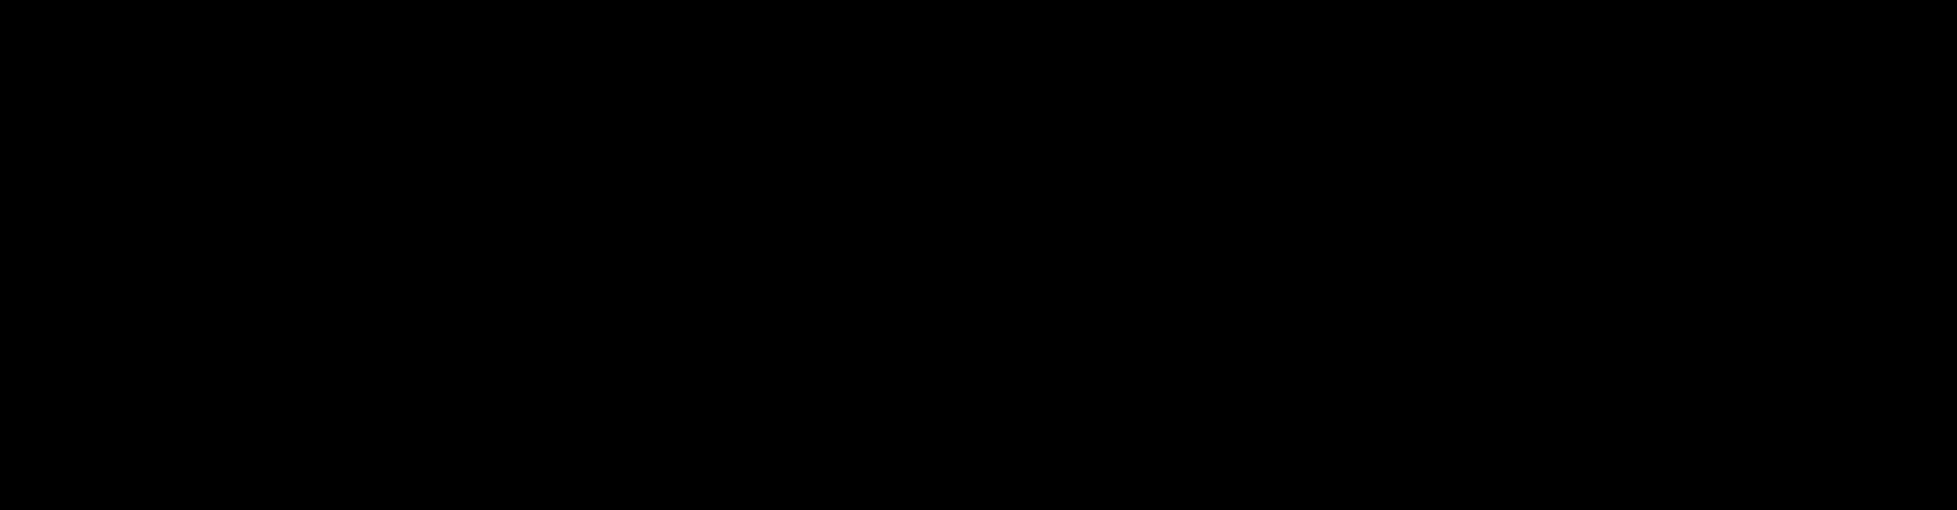 image55.png